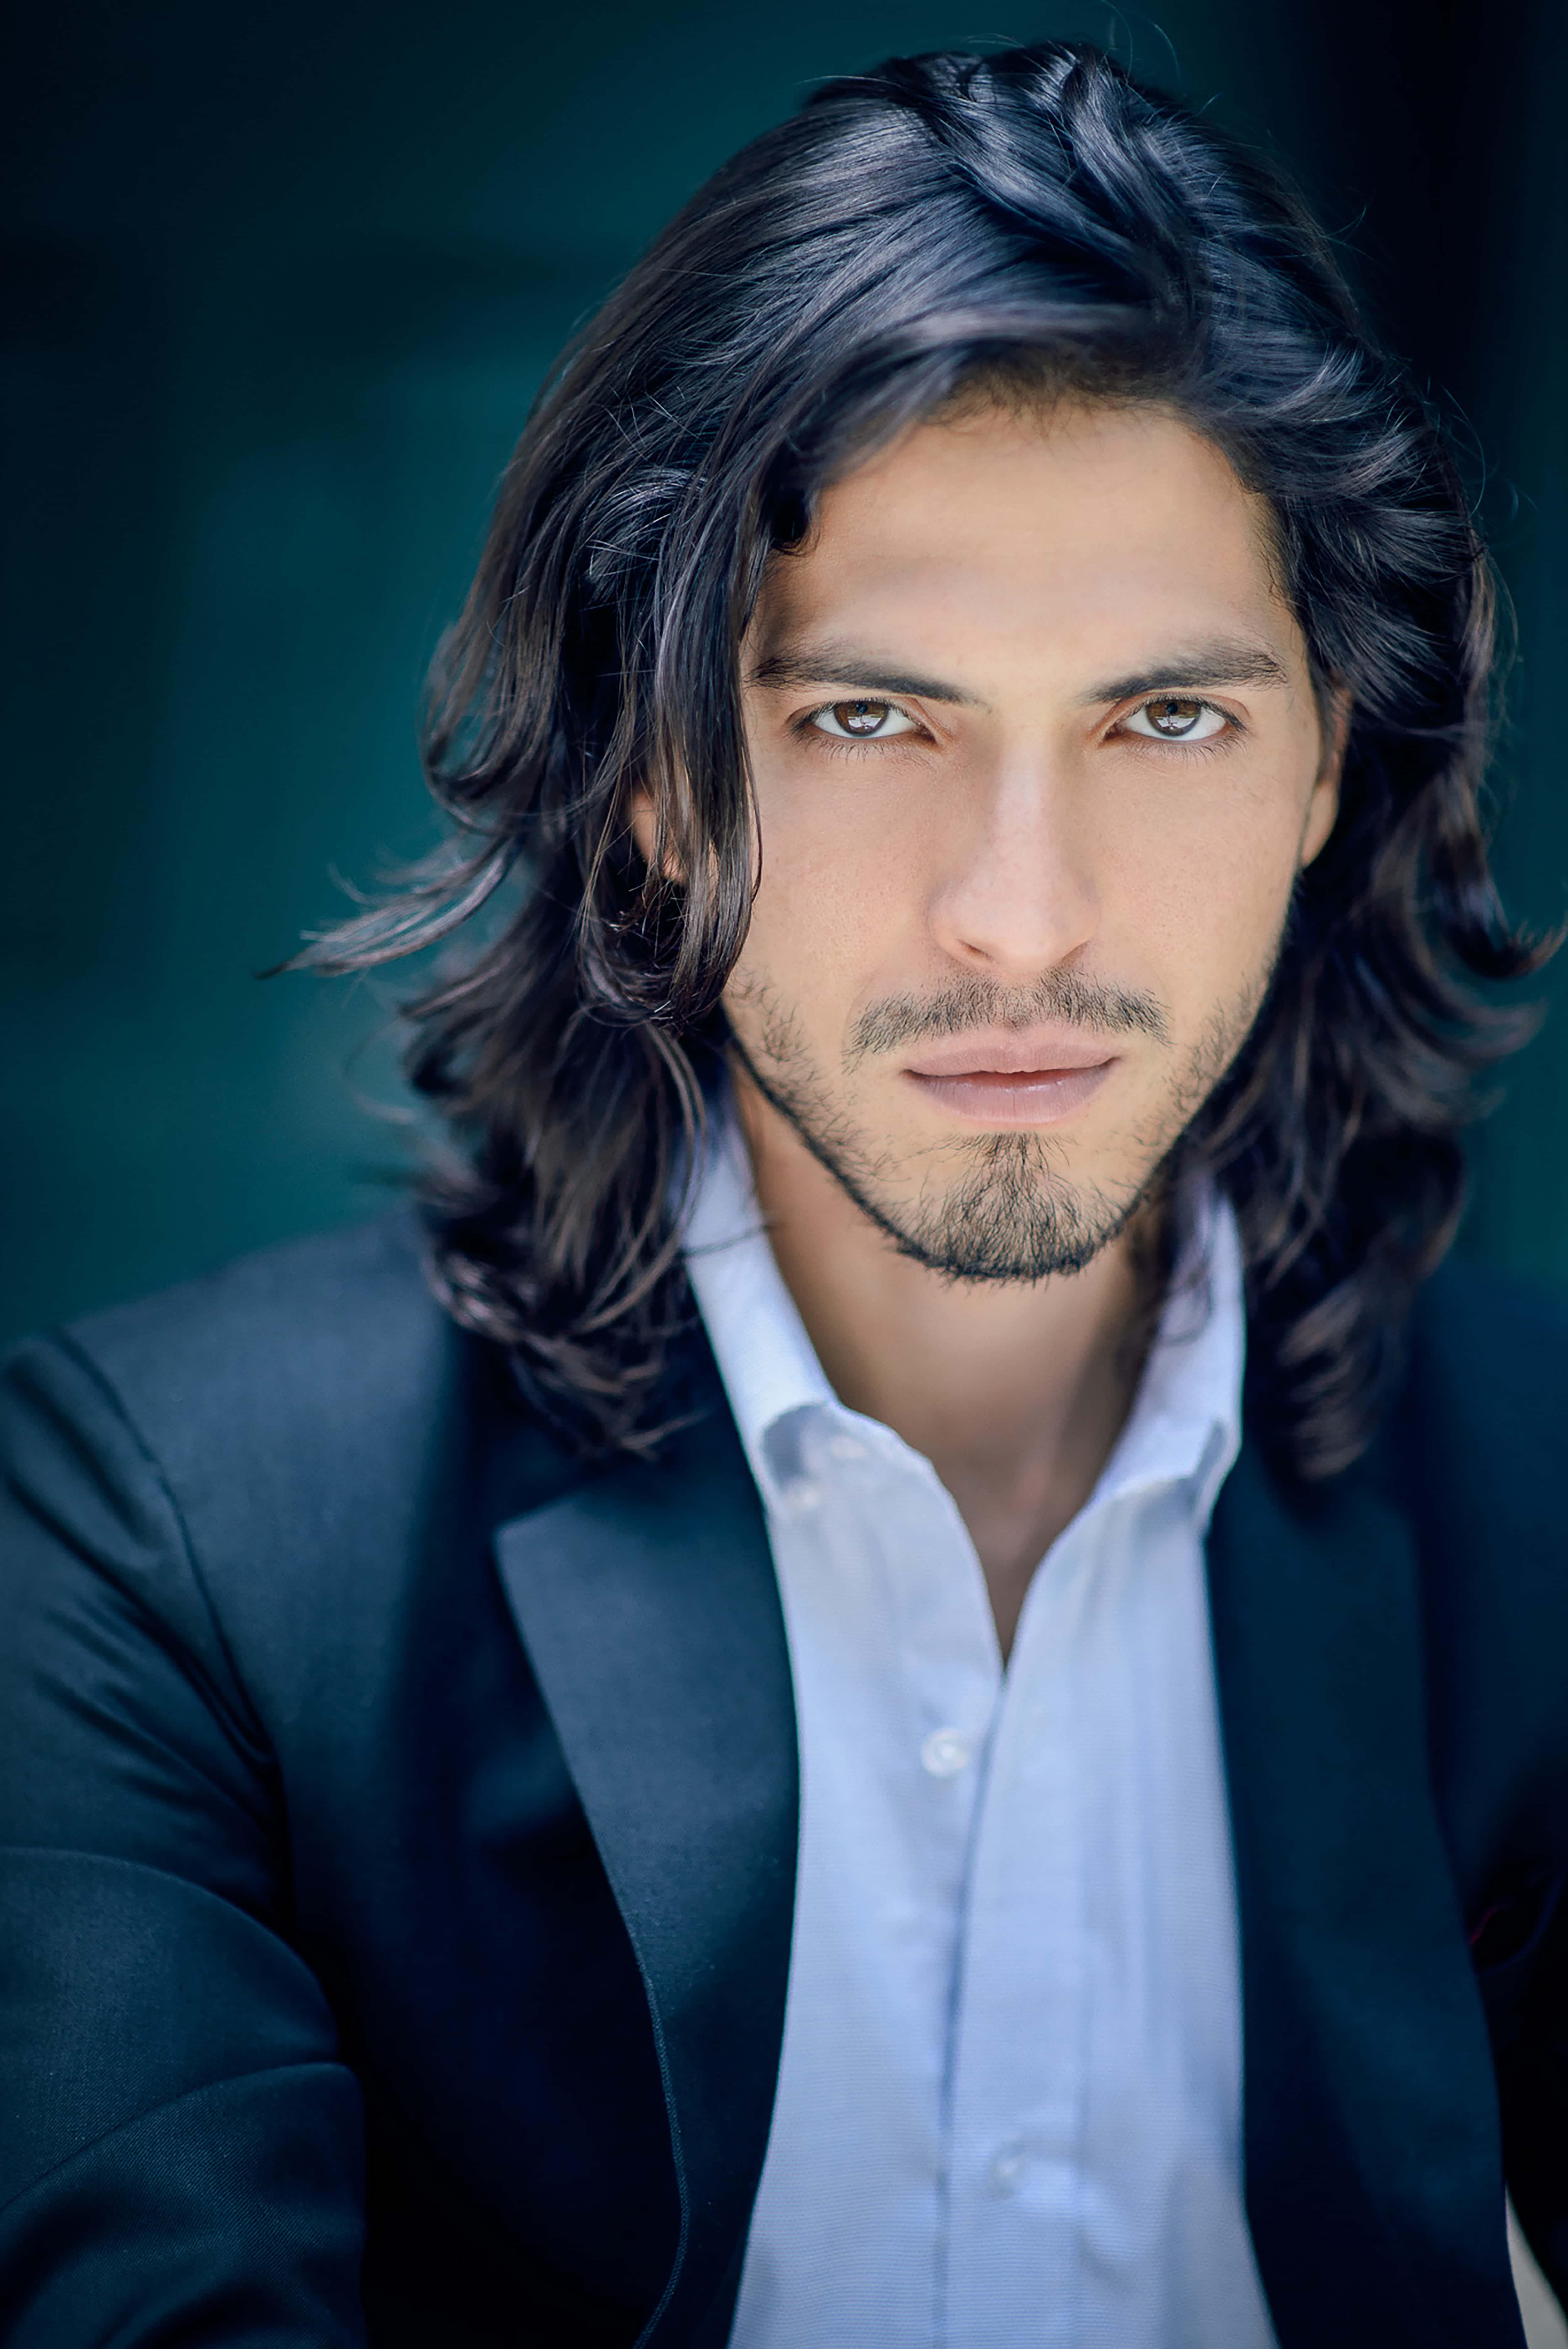 Joel Prieto Sänger Tenor